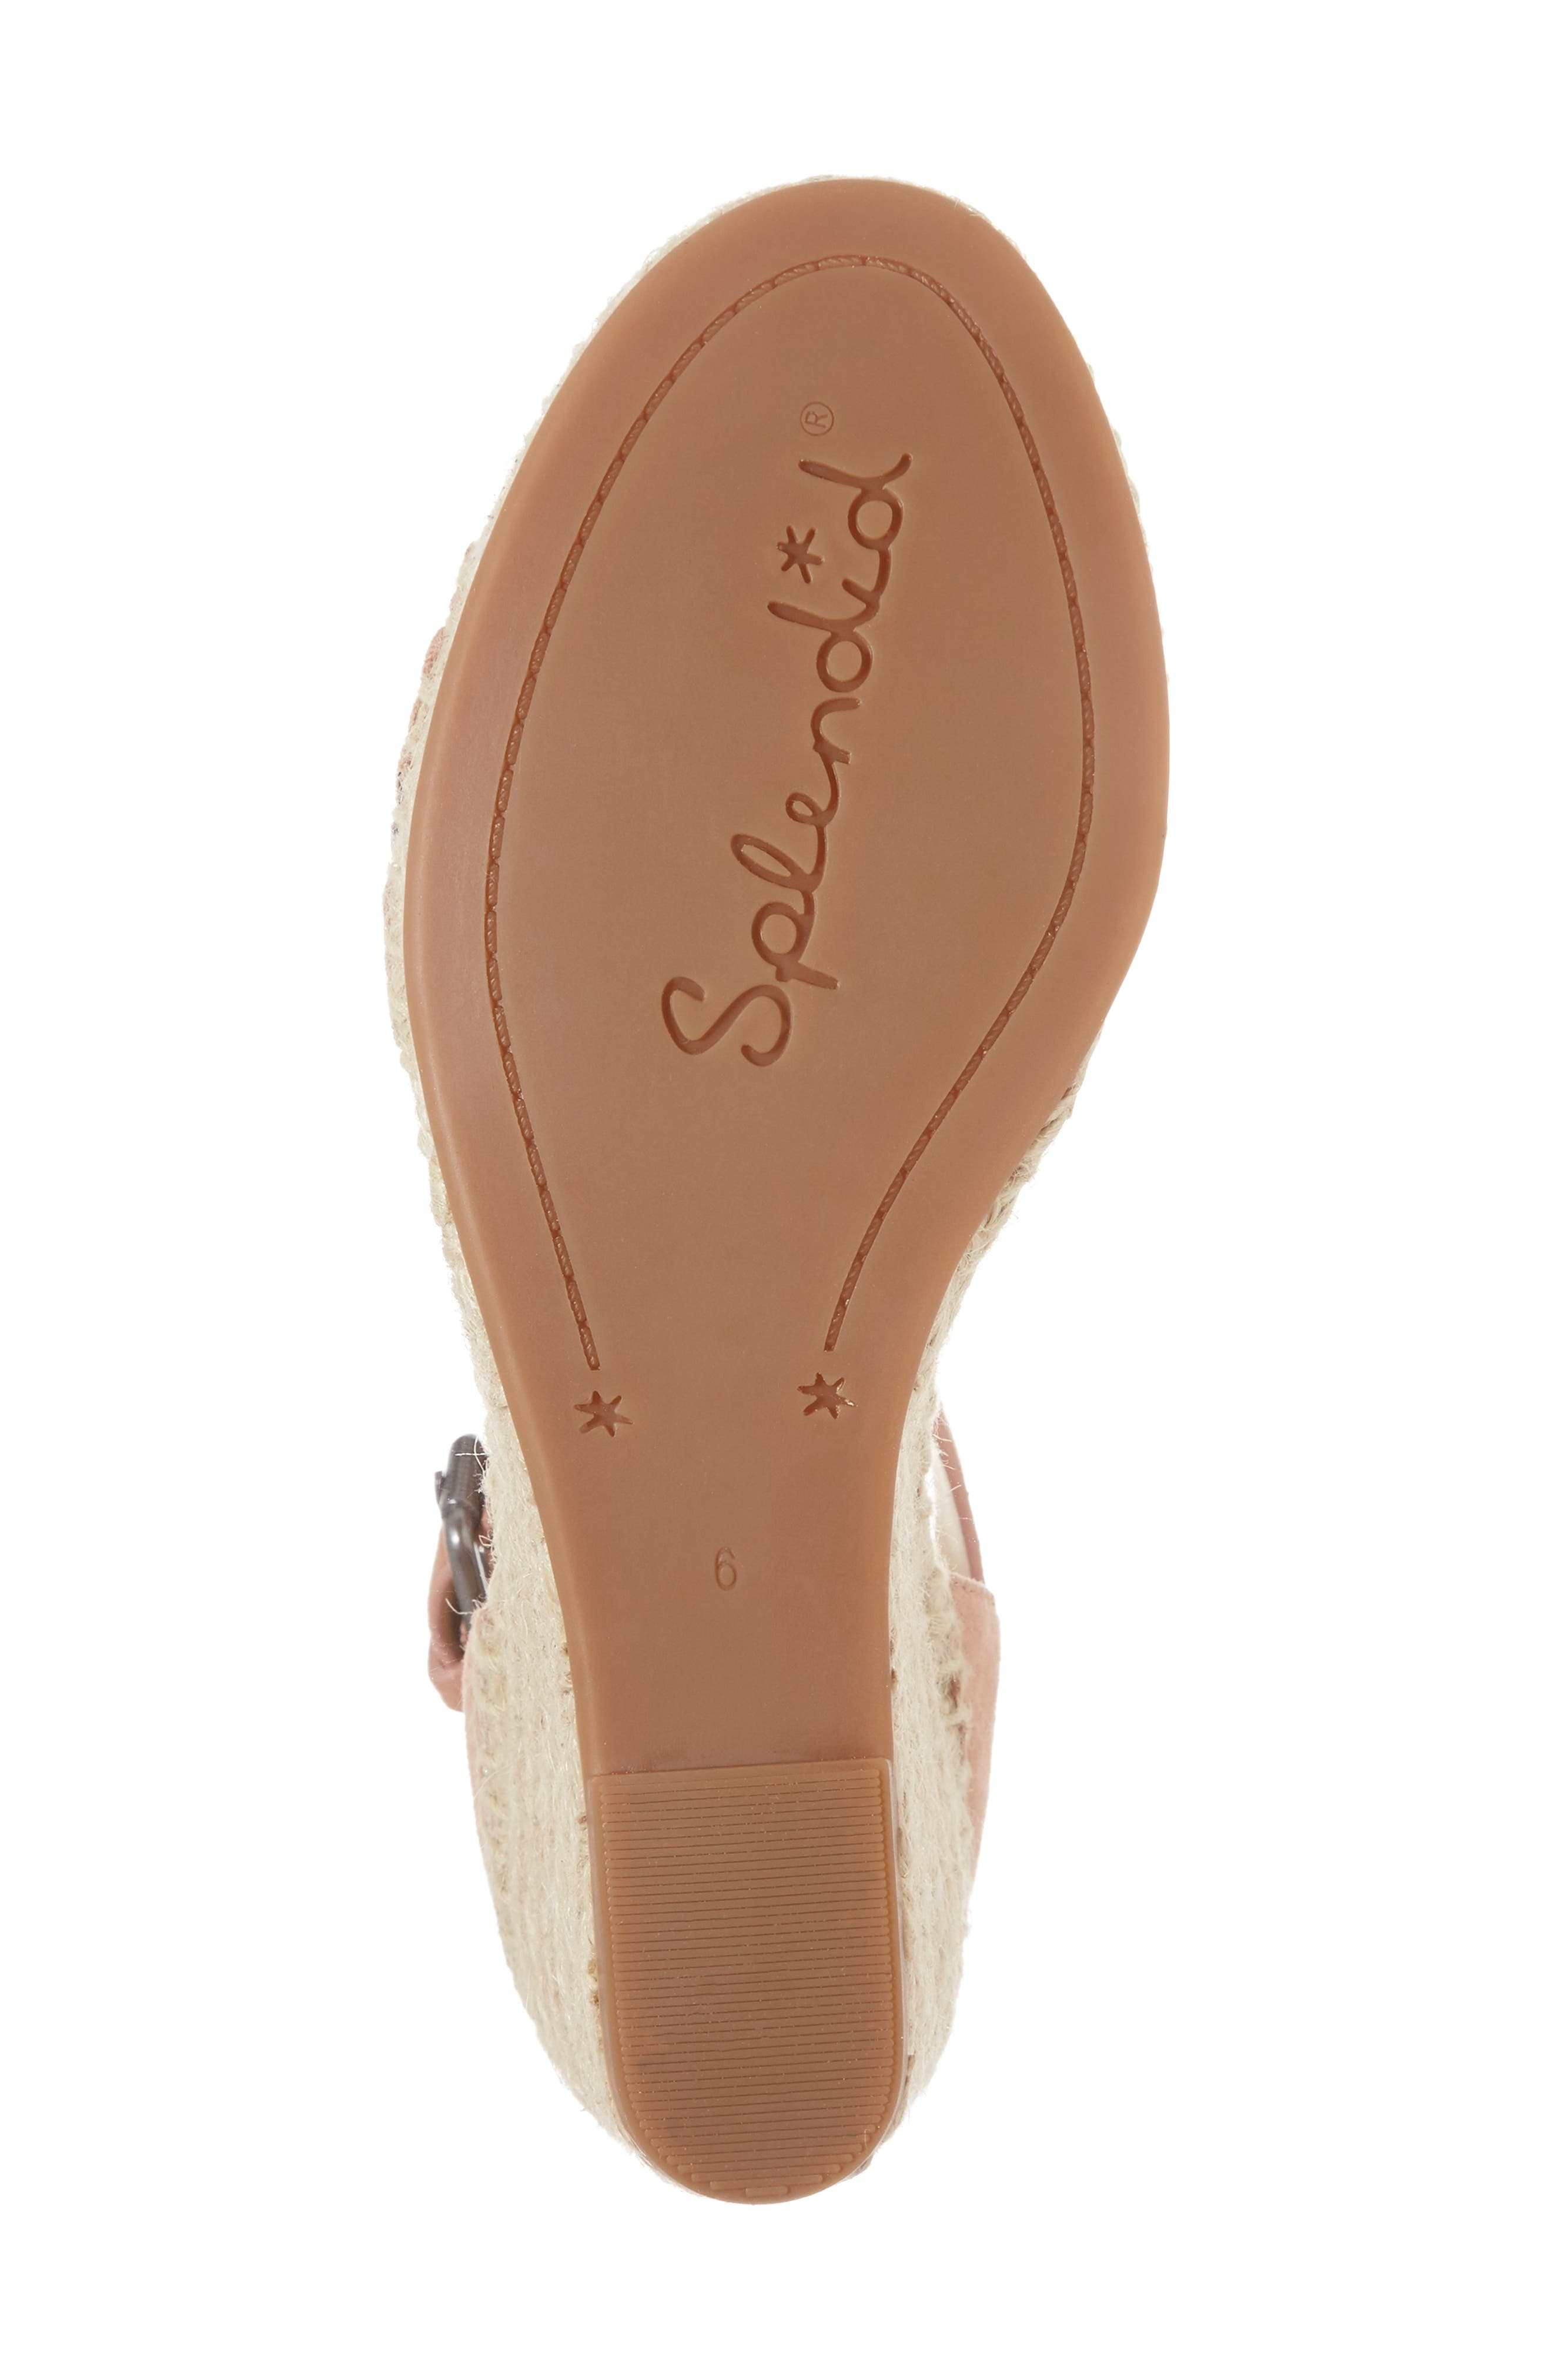 Bedford Espadrille Wedge Sandal,                             Alternate thumbnail 6, color,                             Dark Blush Suede